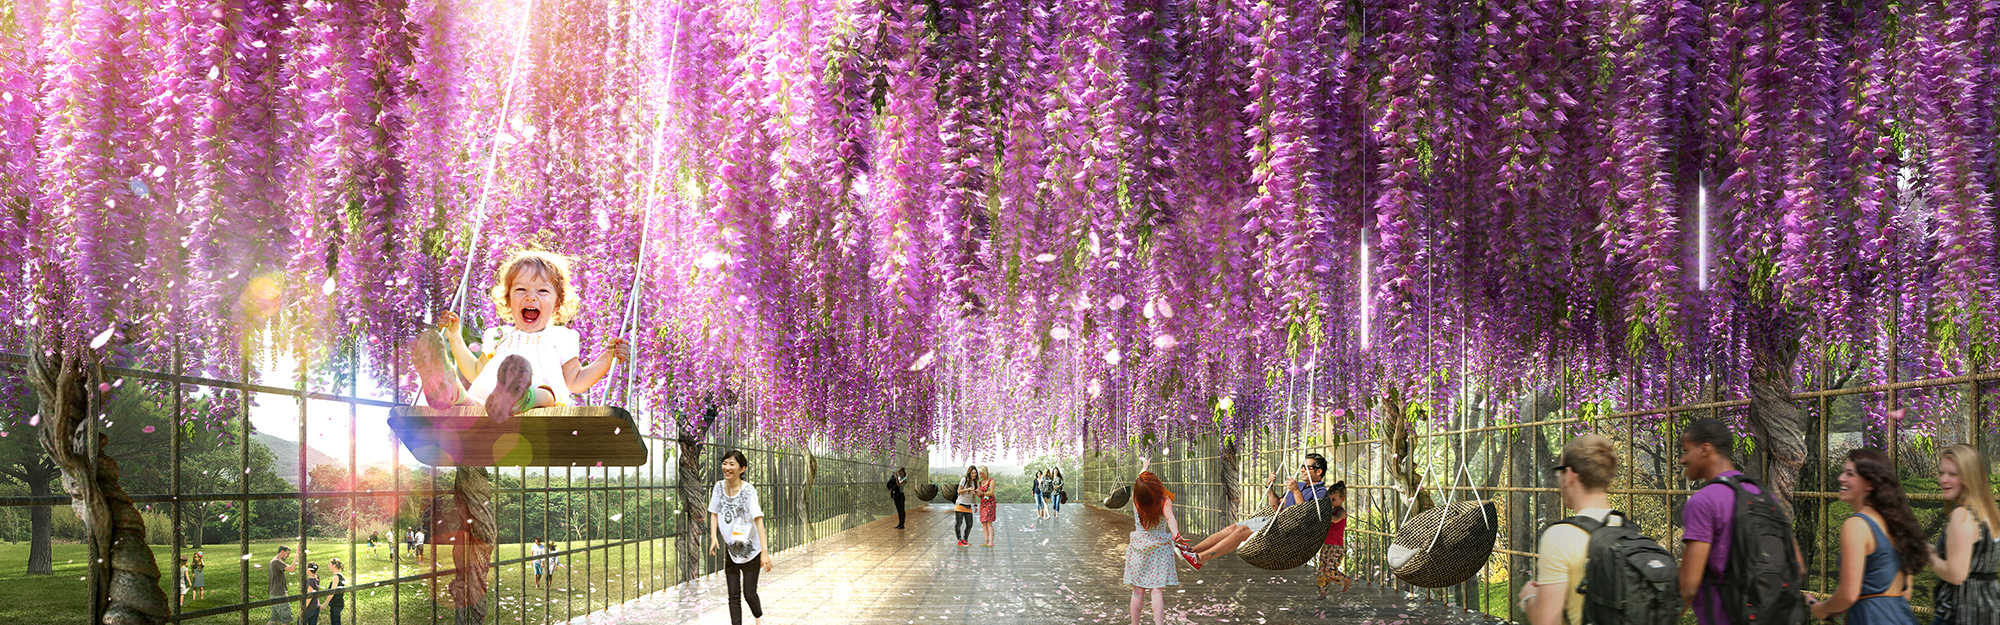 Daniel Valle - Mapo Garden - FLOWER garden